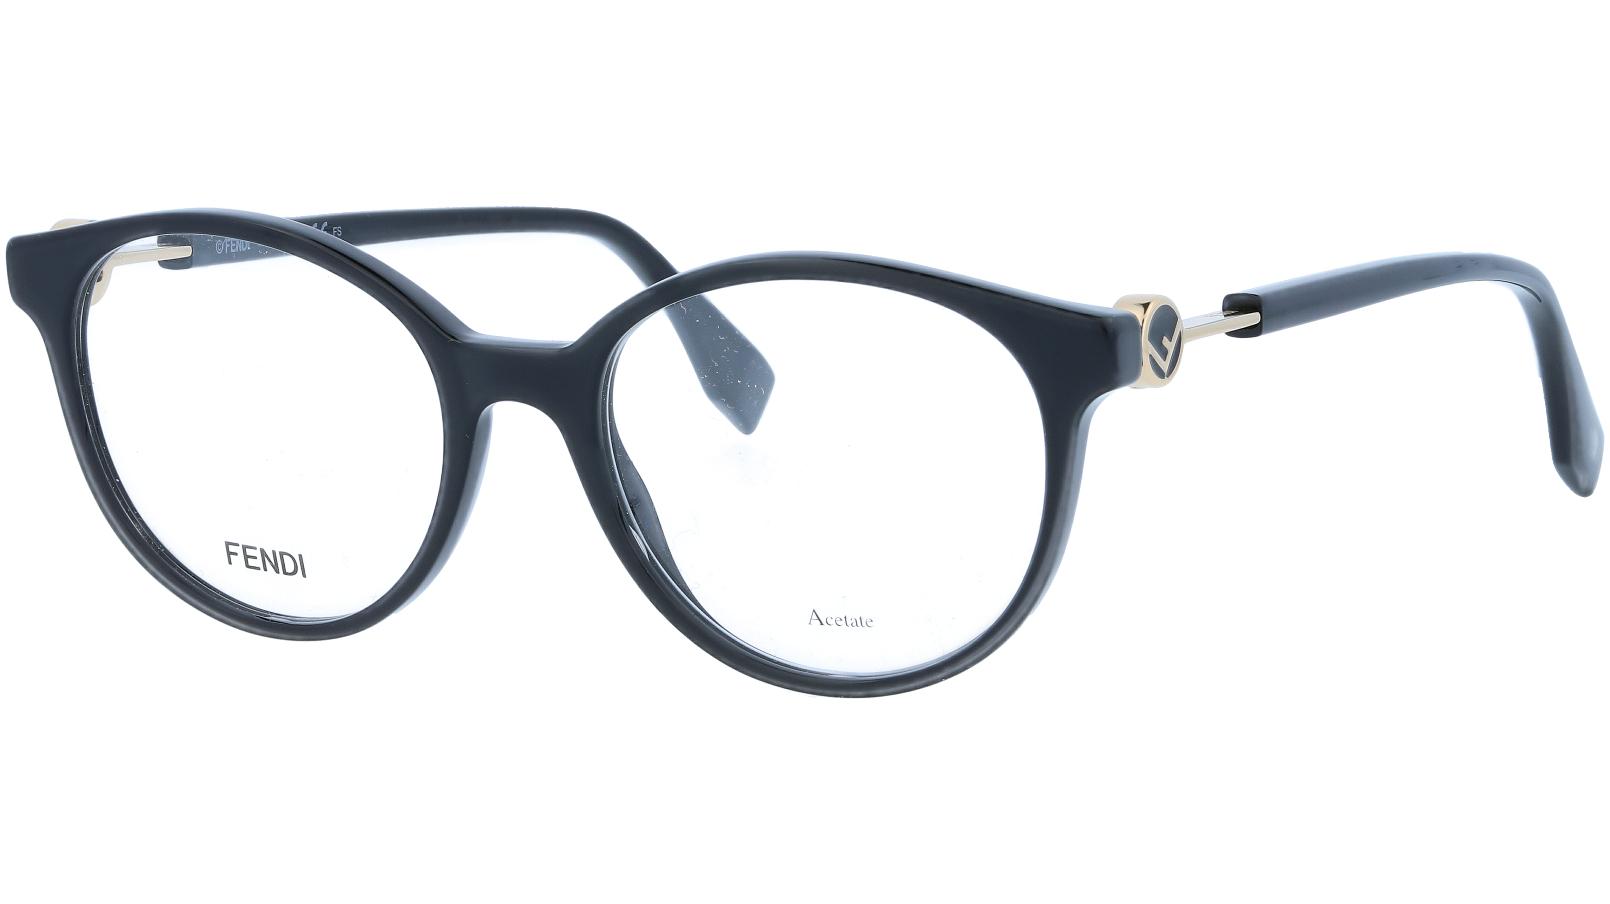 FENDI FF0348 807 50 BLACK Glasses